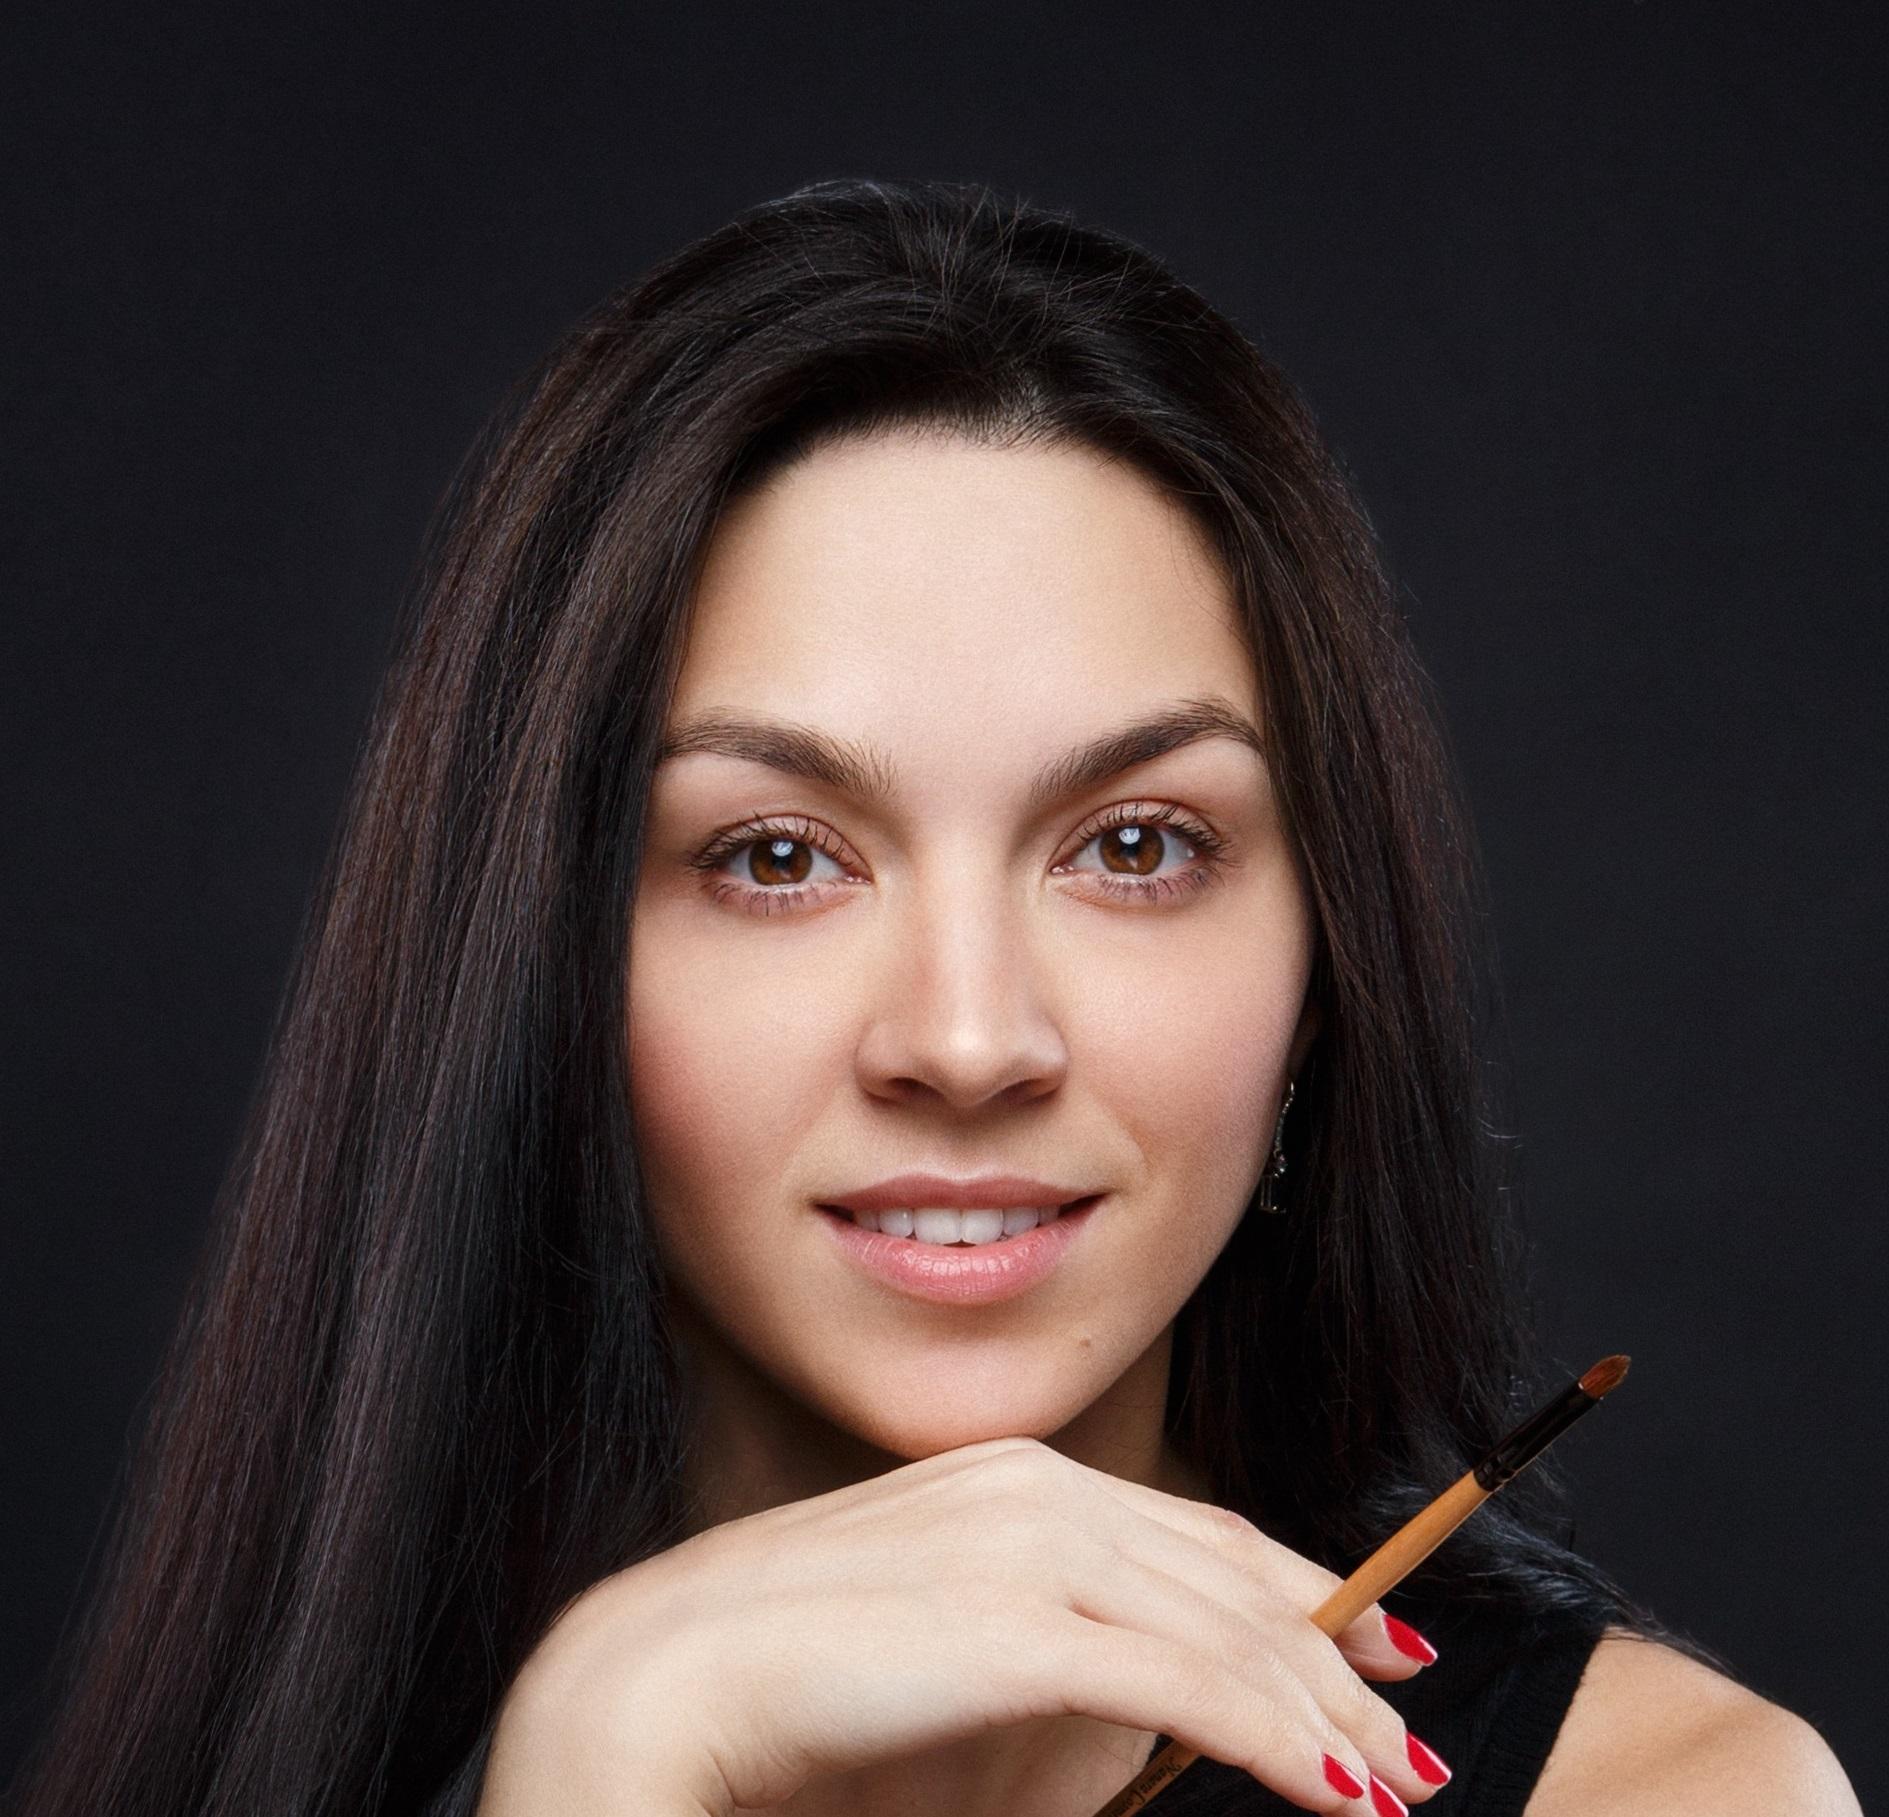 Маша Panova